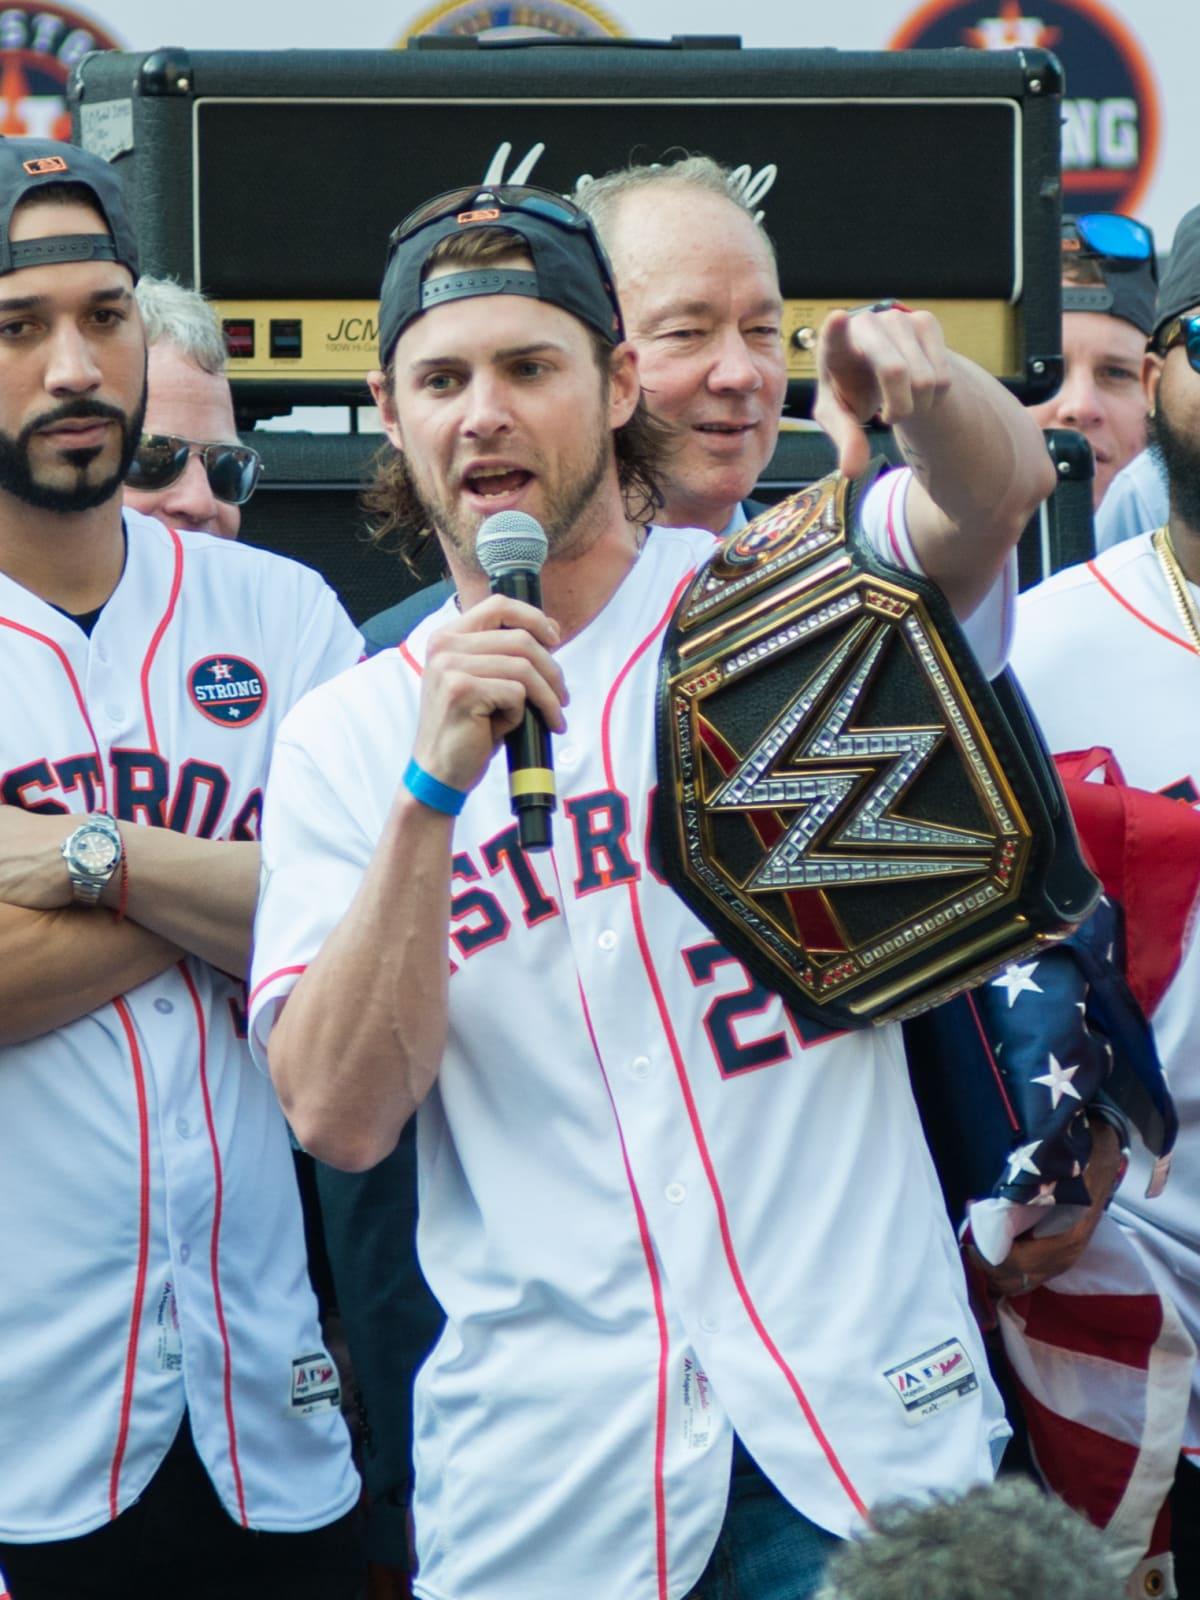 Astros World Series victory parade and rally Josh Reddick